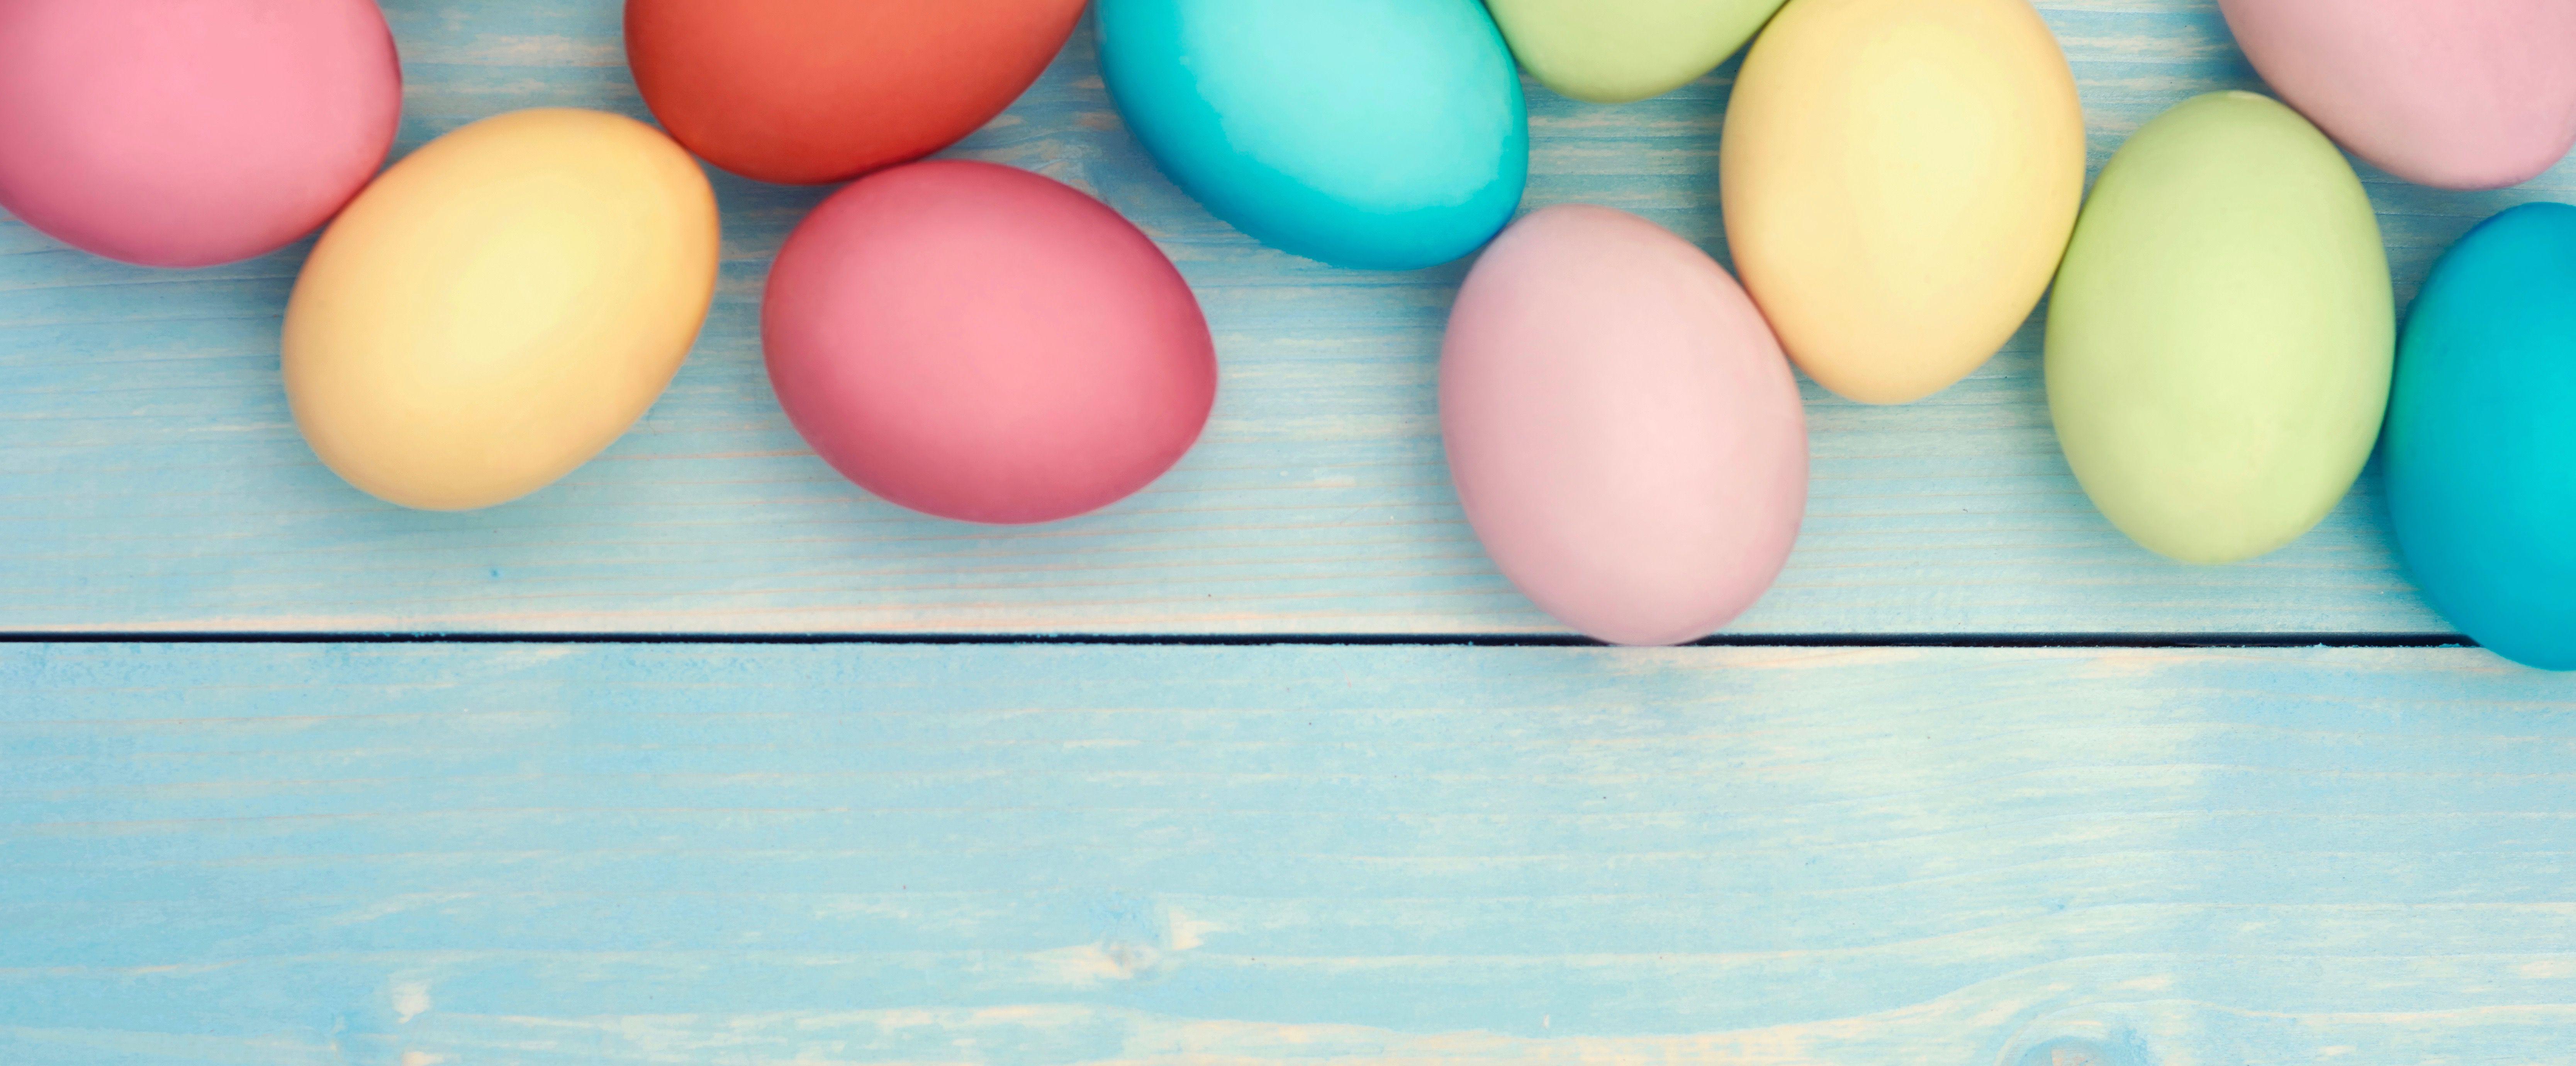 Easter Eggs: 10 of the Internet's Best Hidden Gems